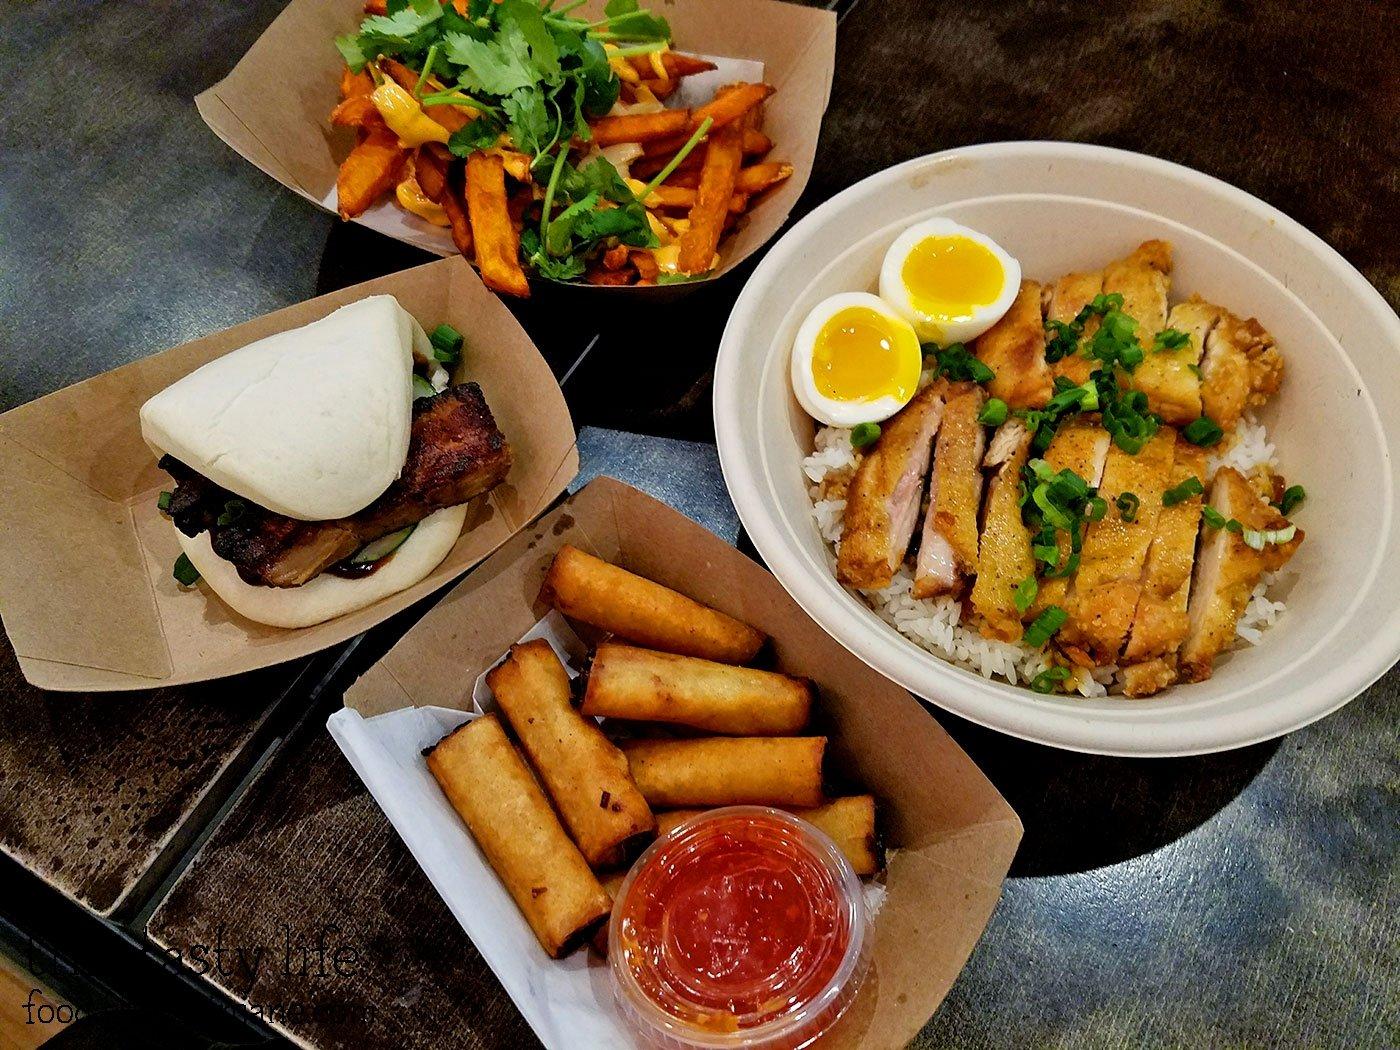 Oi Asian Fusion - This Tasty Life